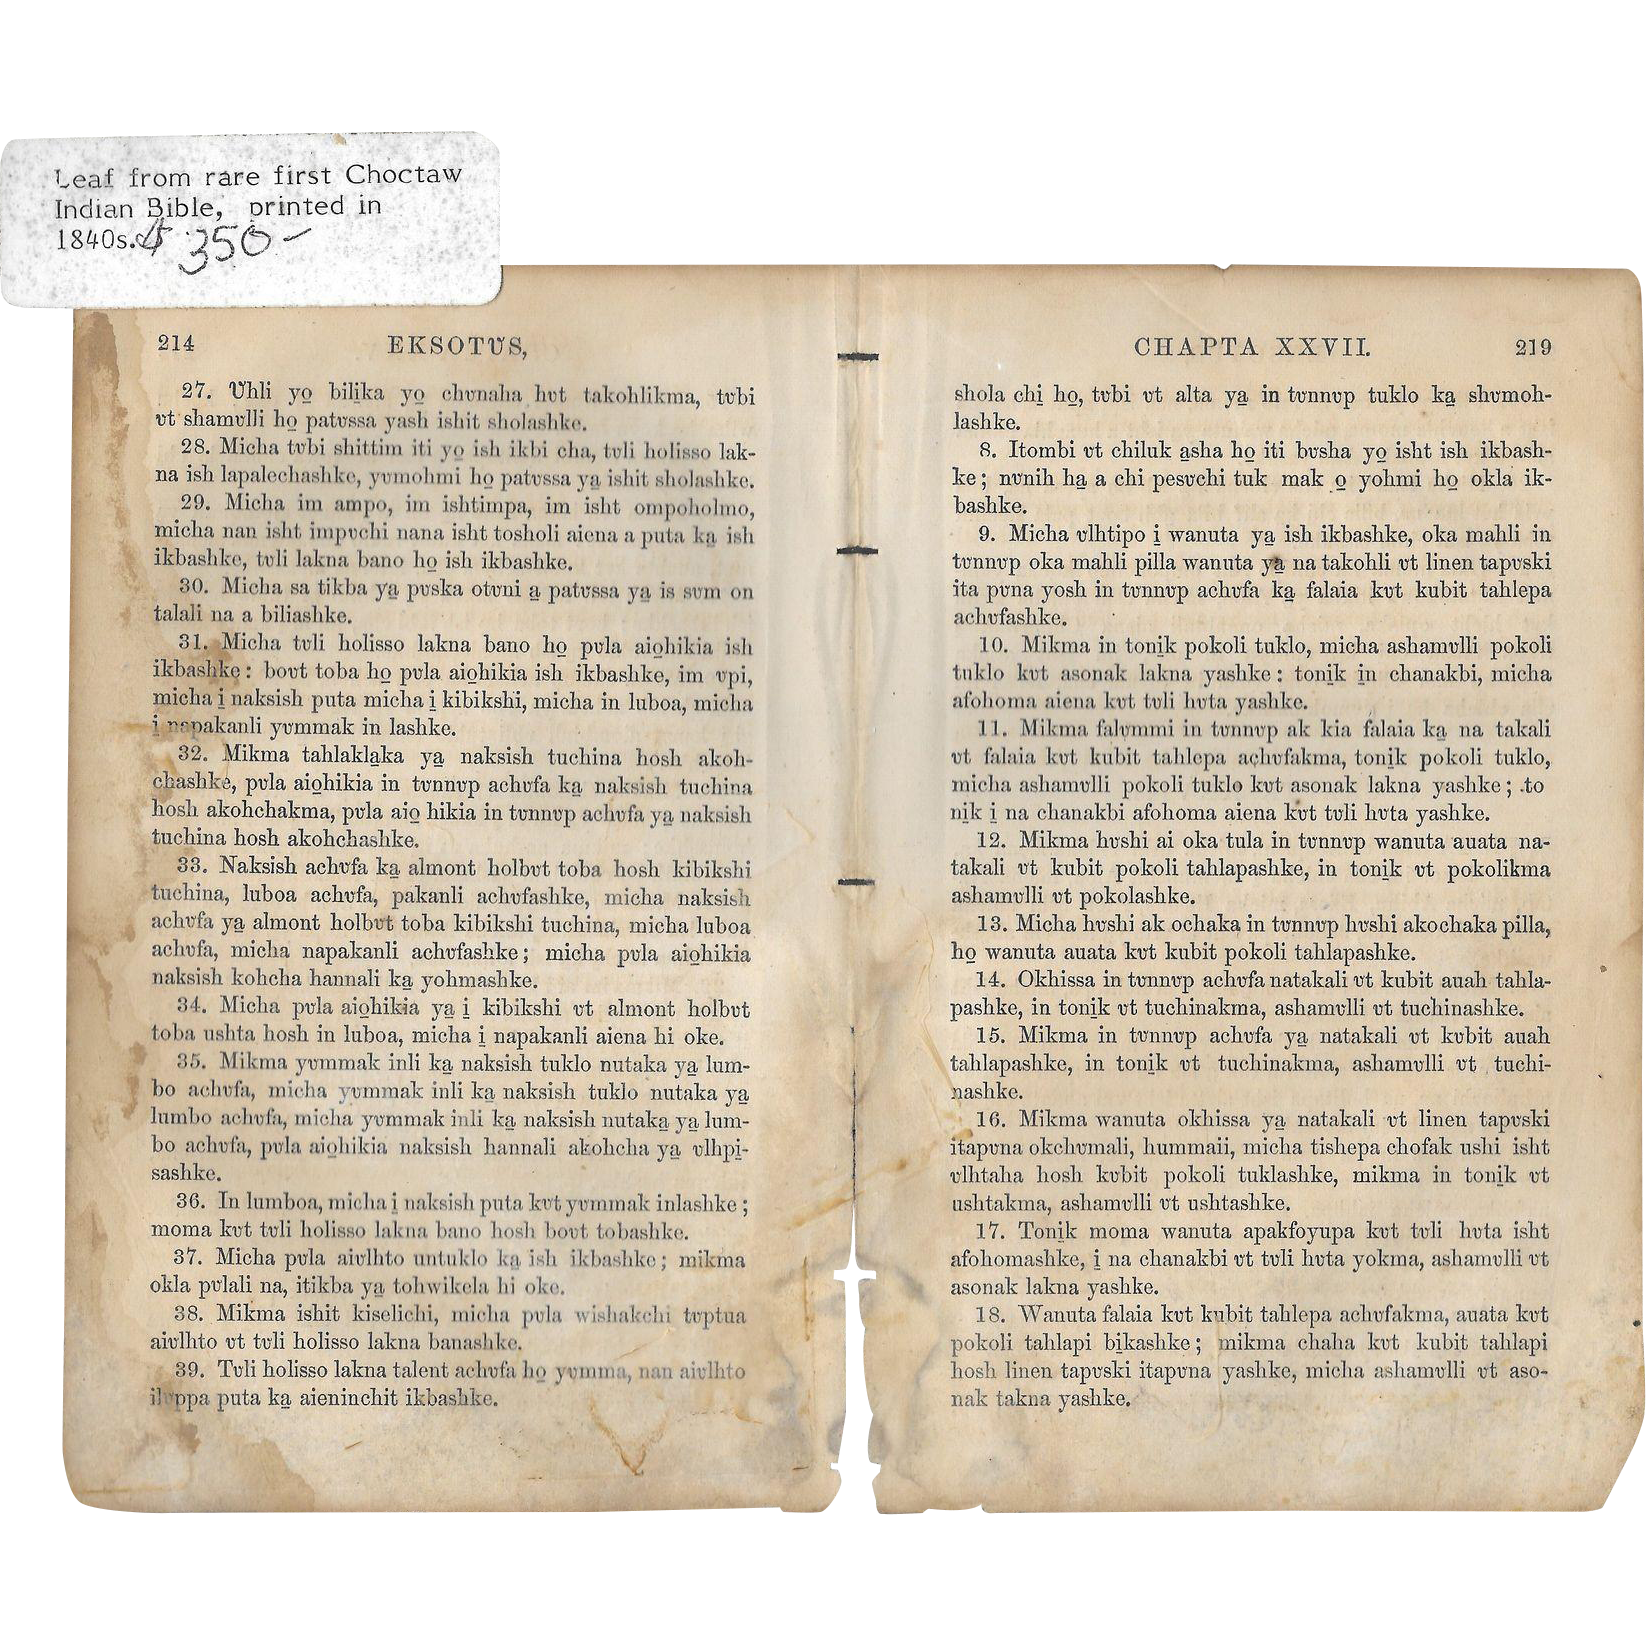 Vintage 1867 Choctaw Translation Bible Page Exodus American Bible Society, NY